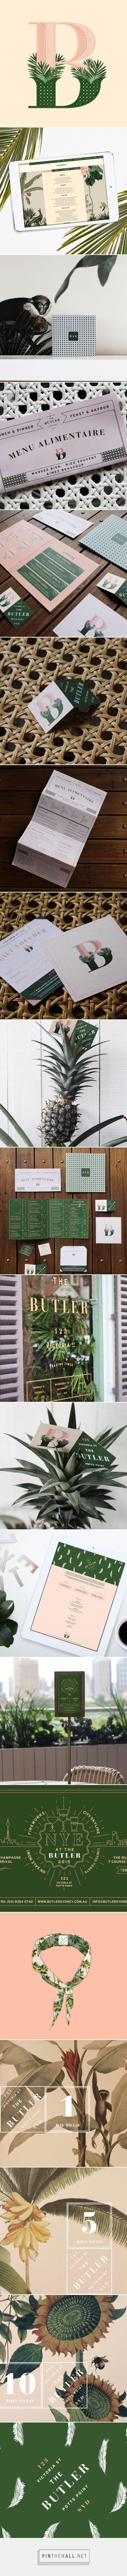 White apron menu warrington - The Butler Potts Point Restaurant Branding And Menu Design By Julia Jacque